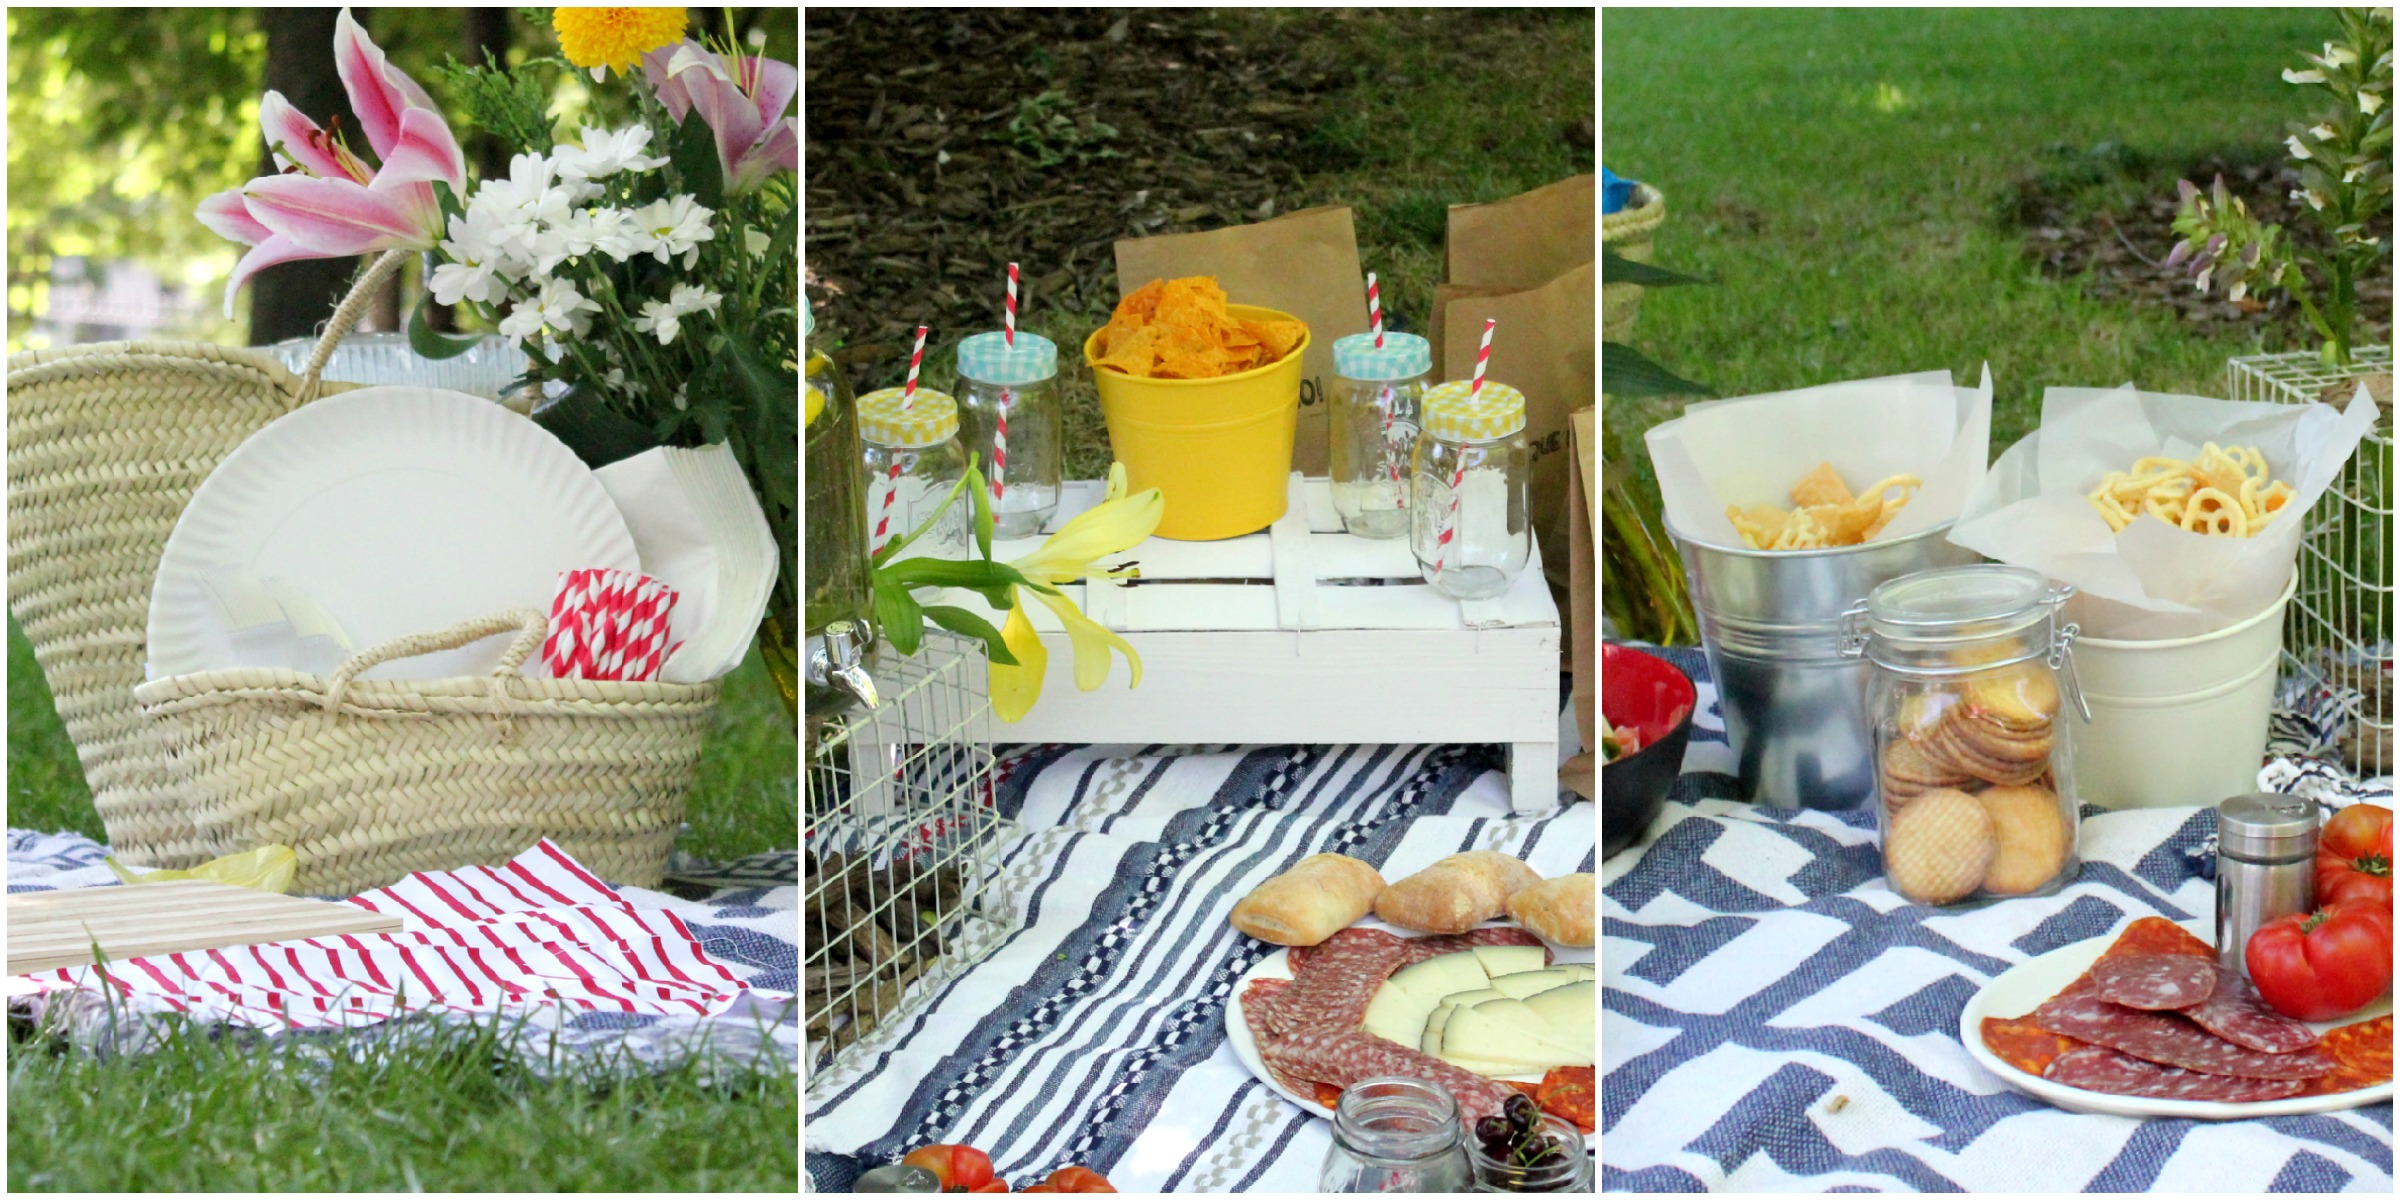 Un picnic de cumplea os pepita pancracia - Decoracion del jardin ...